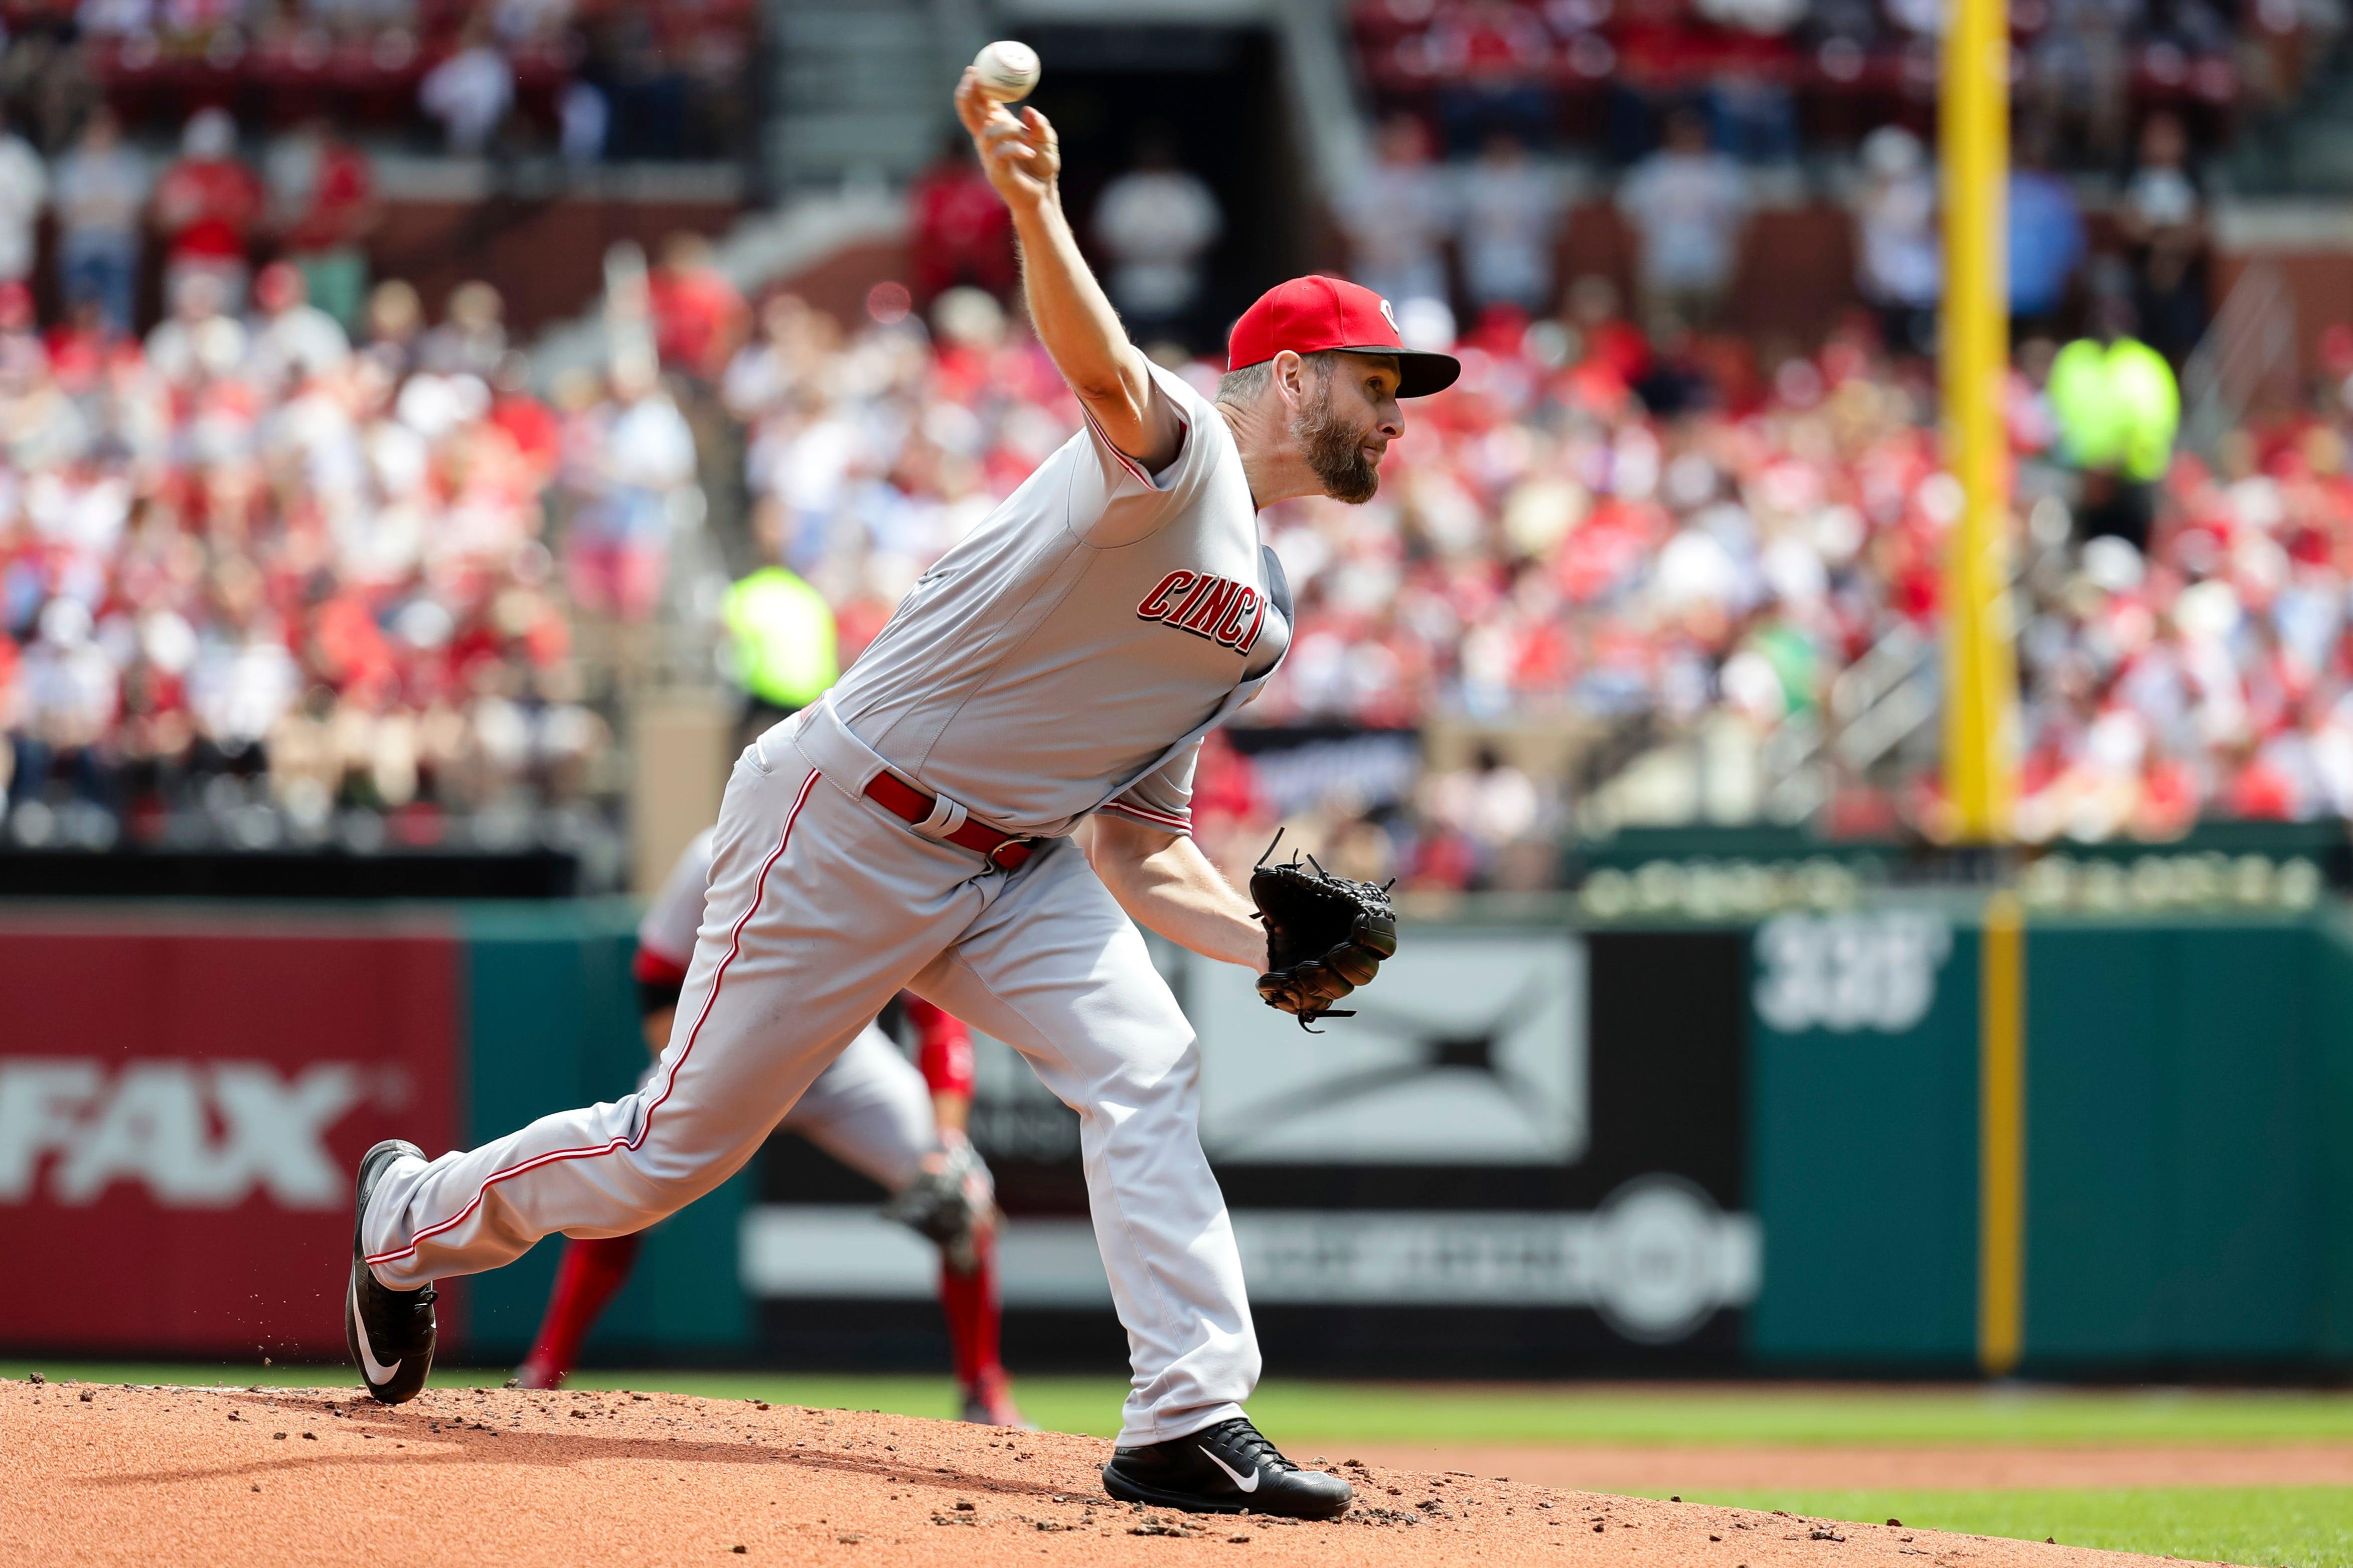 Scott Feldman, Adam Duvall power Reds to series win in St. Louis